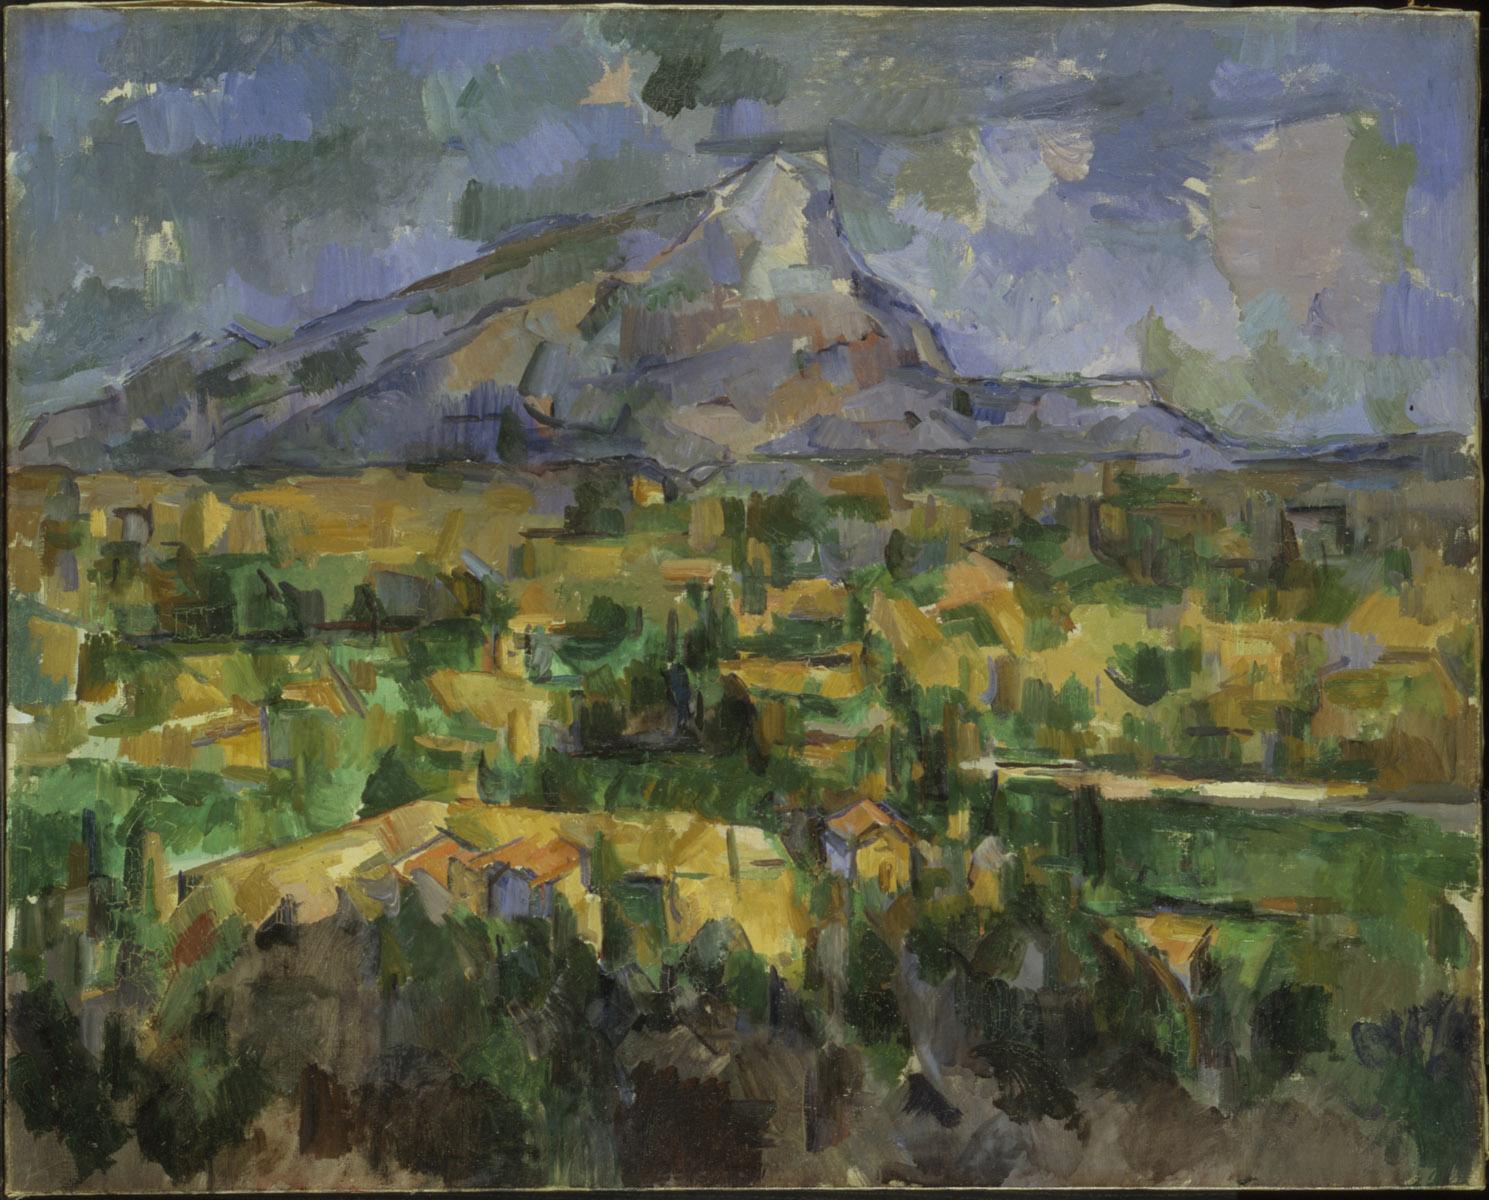 Сезанн картина Mont Sainte Victoire 1904 пейзажи природы Сафиуллин